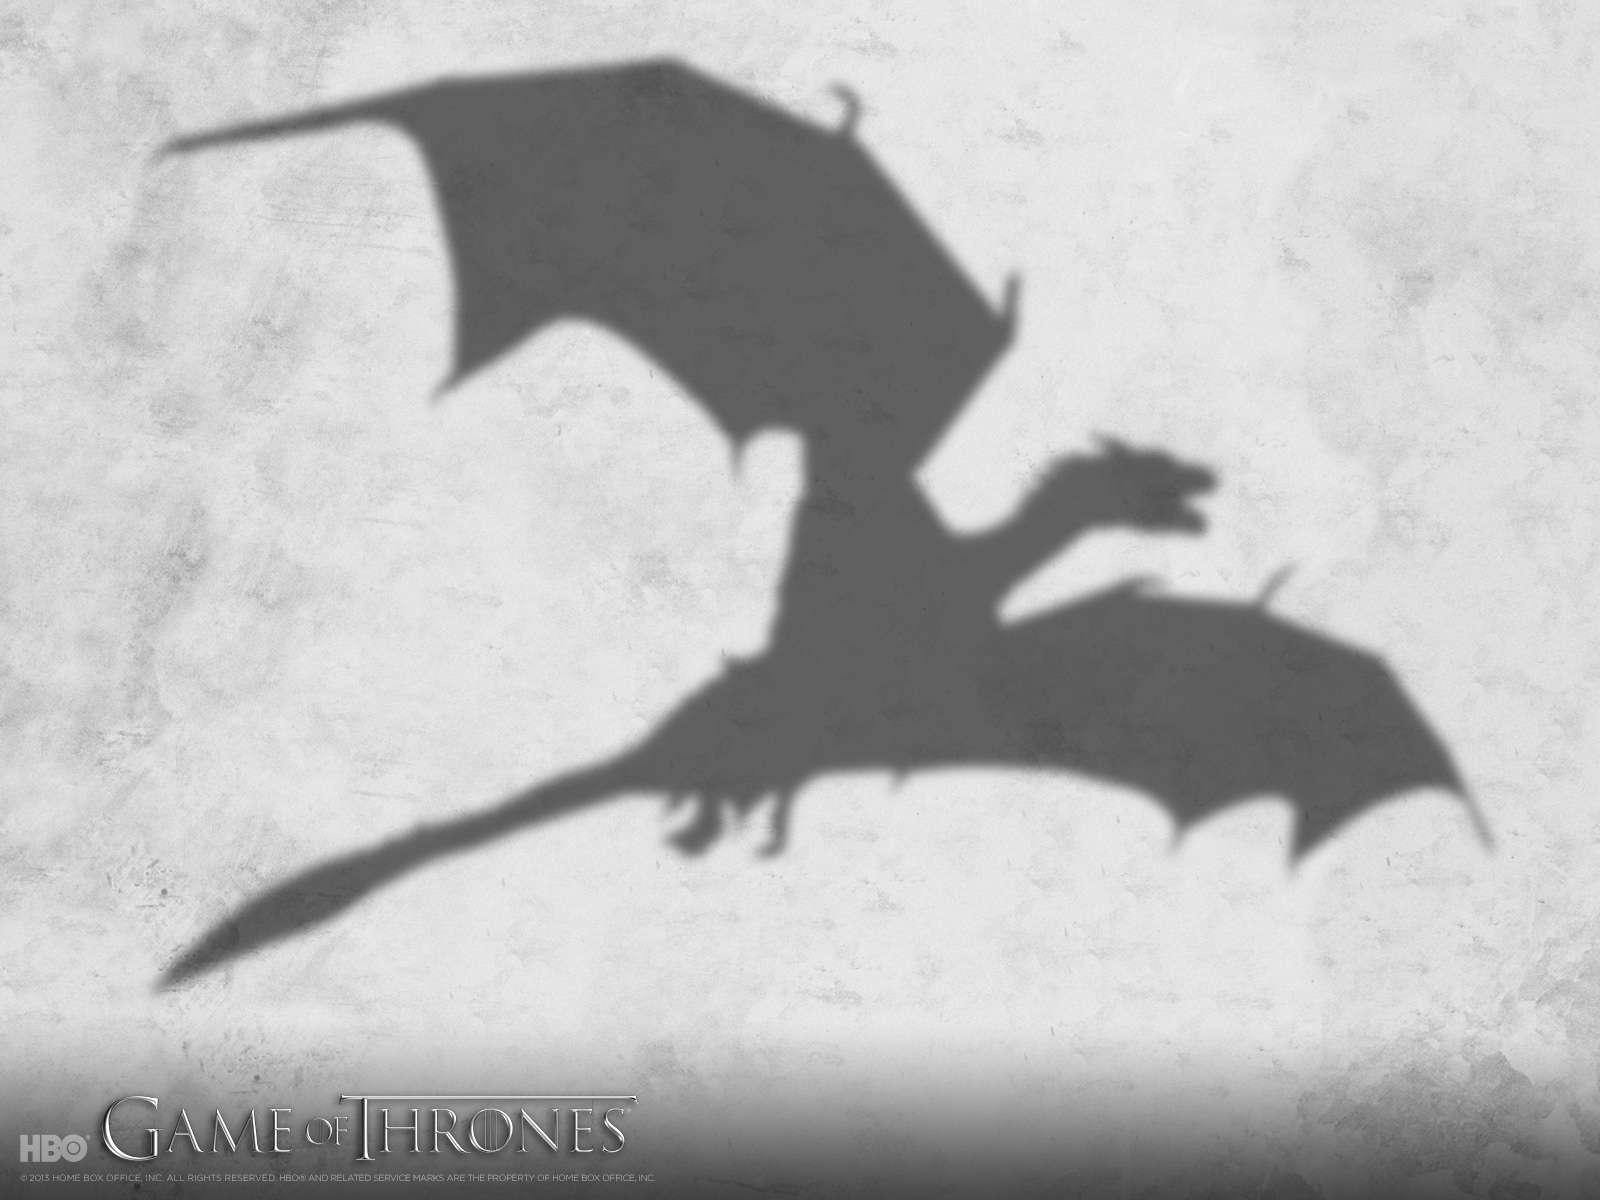 Juego de tronos - Game of thrones Wallpapers